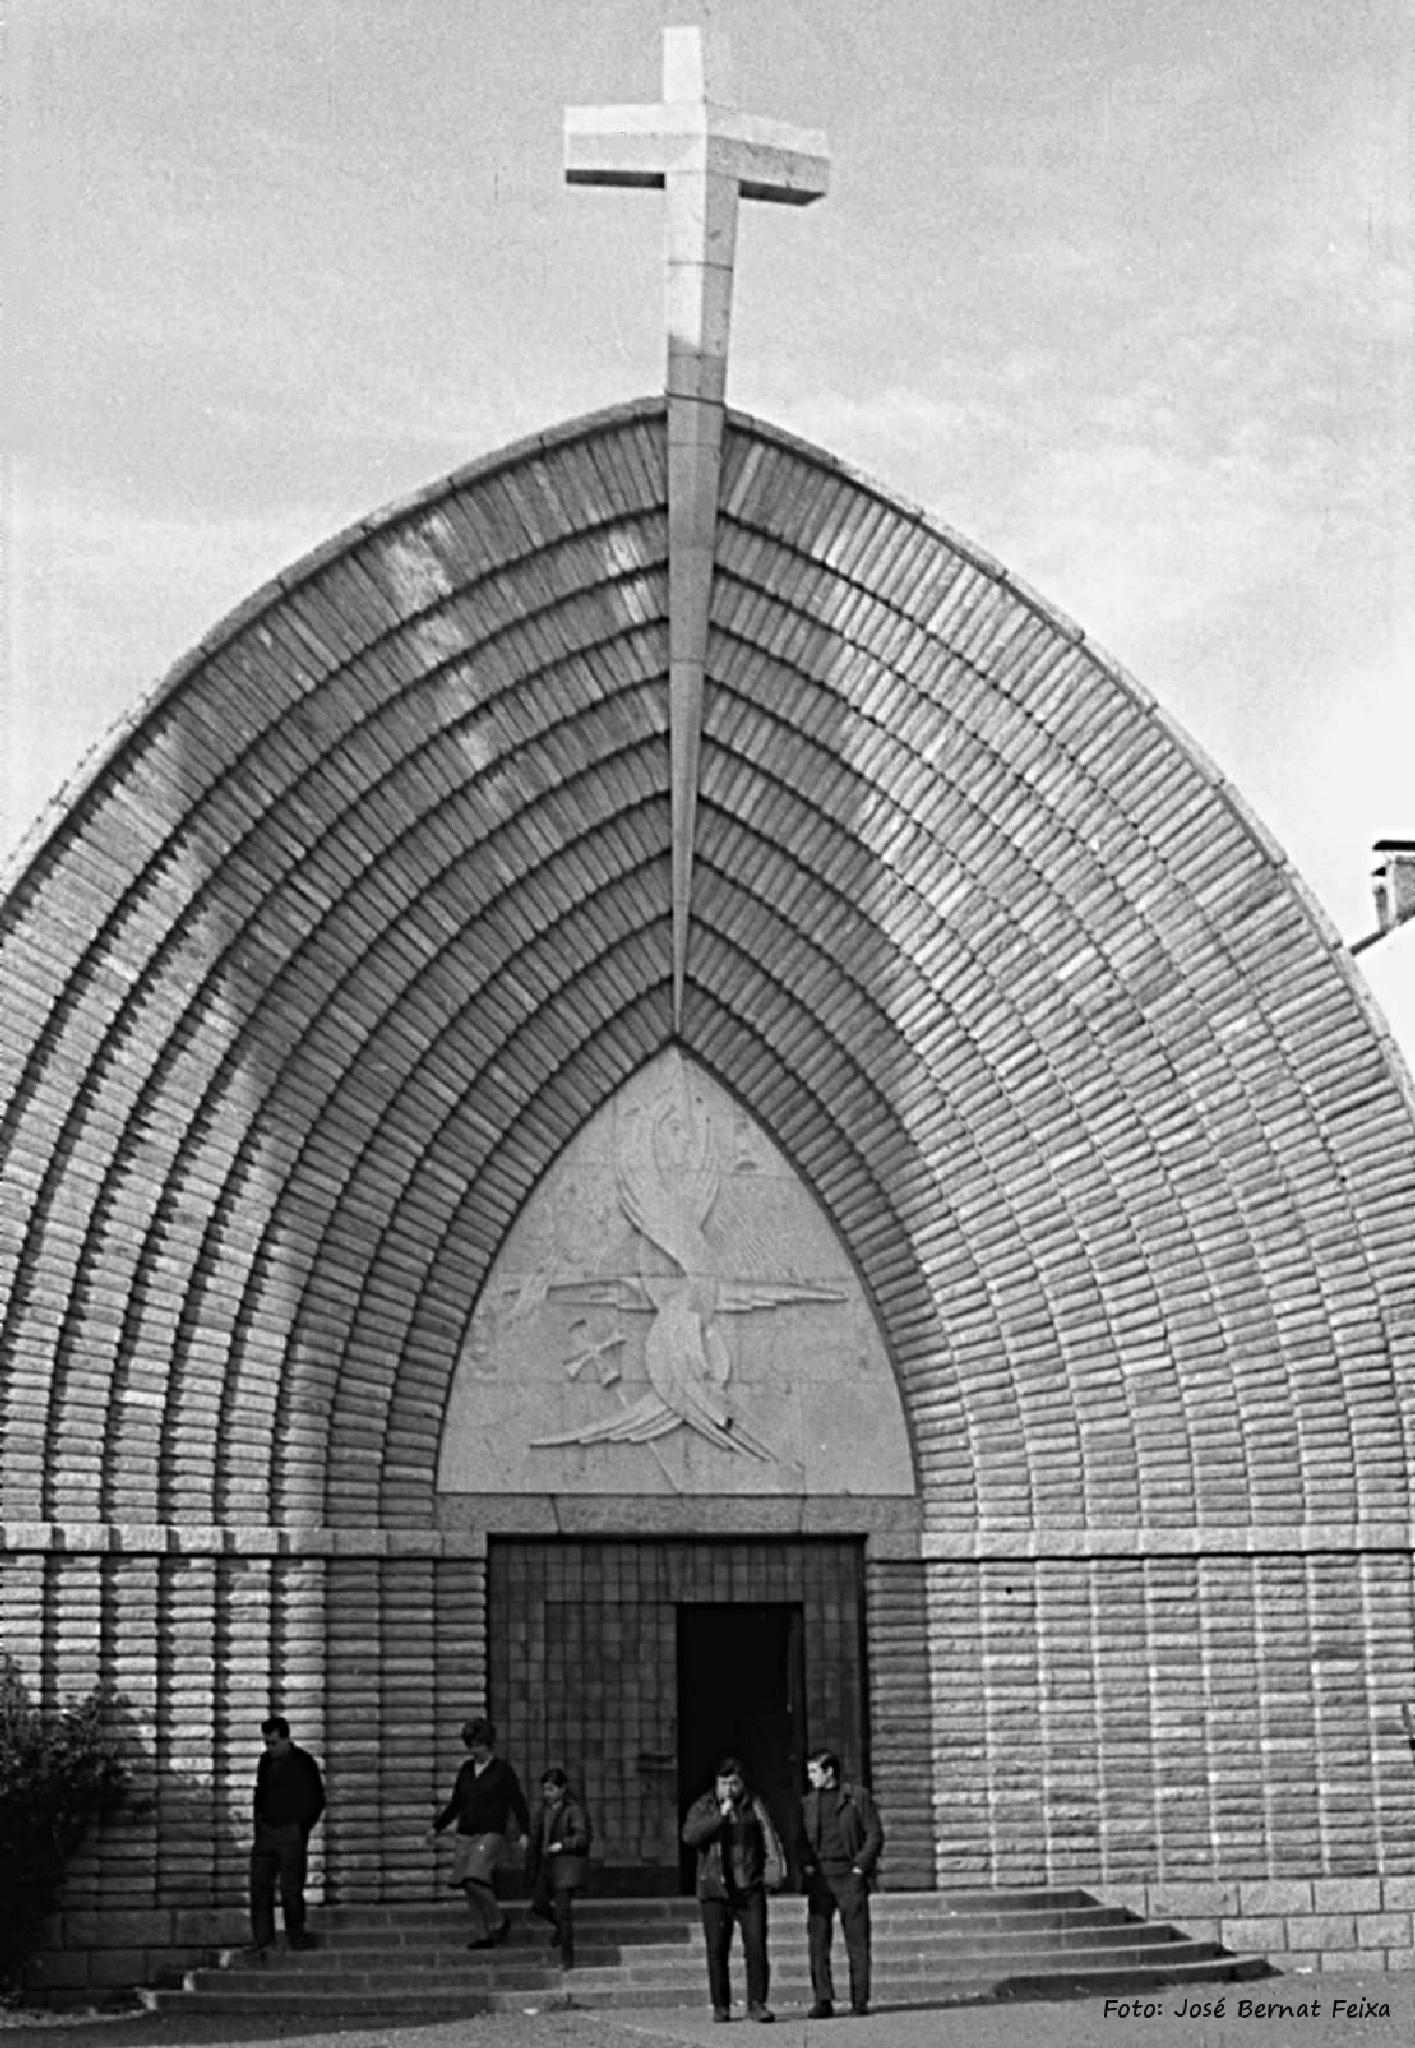 IGLESIA, KERK, CHURCH (60's) by José Bernat Feixa